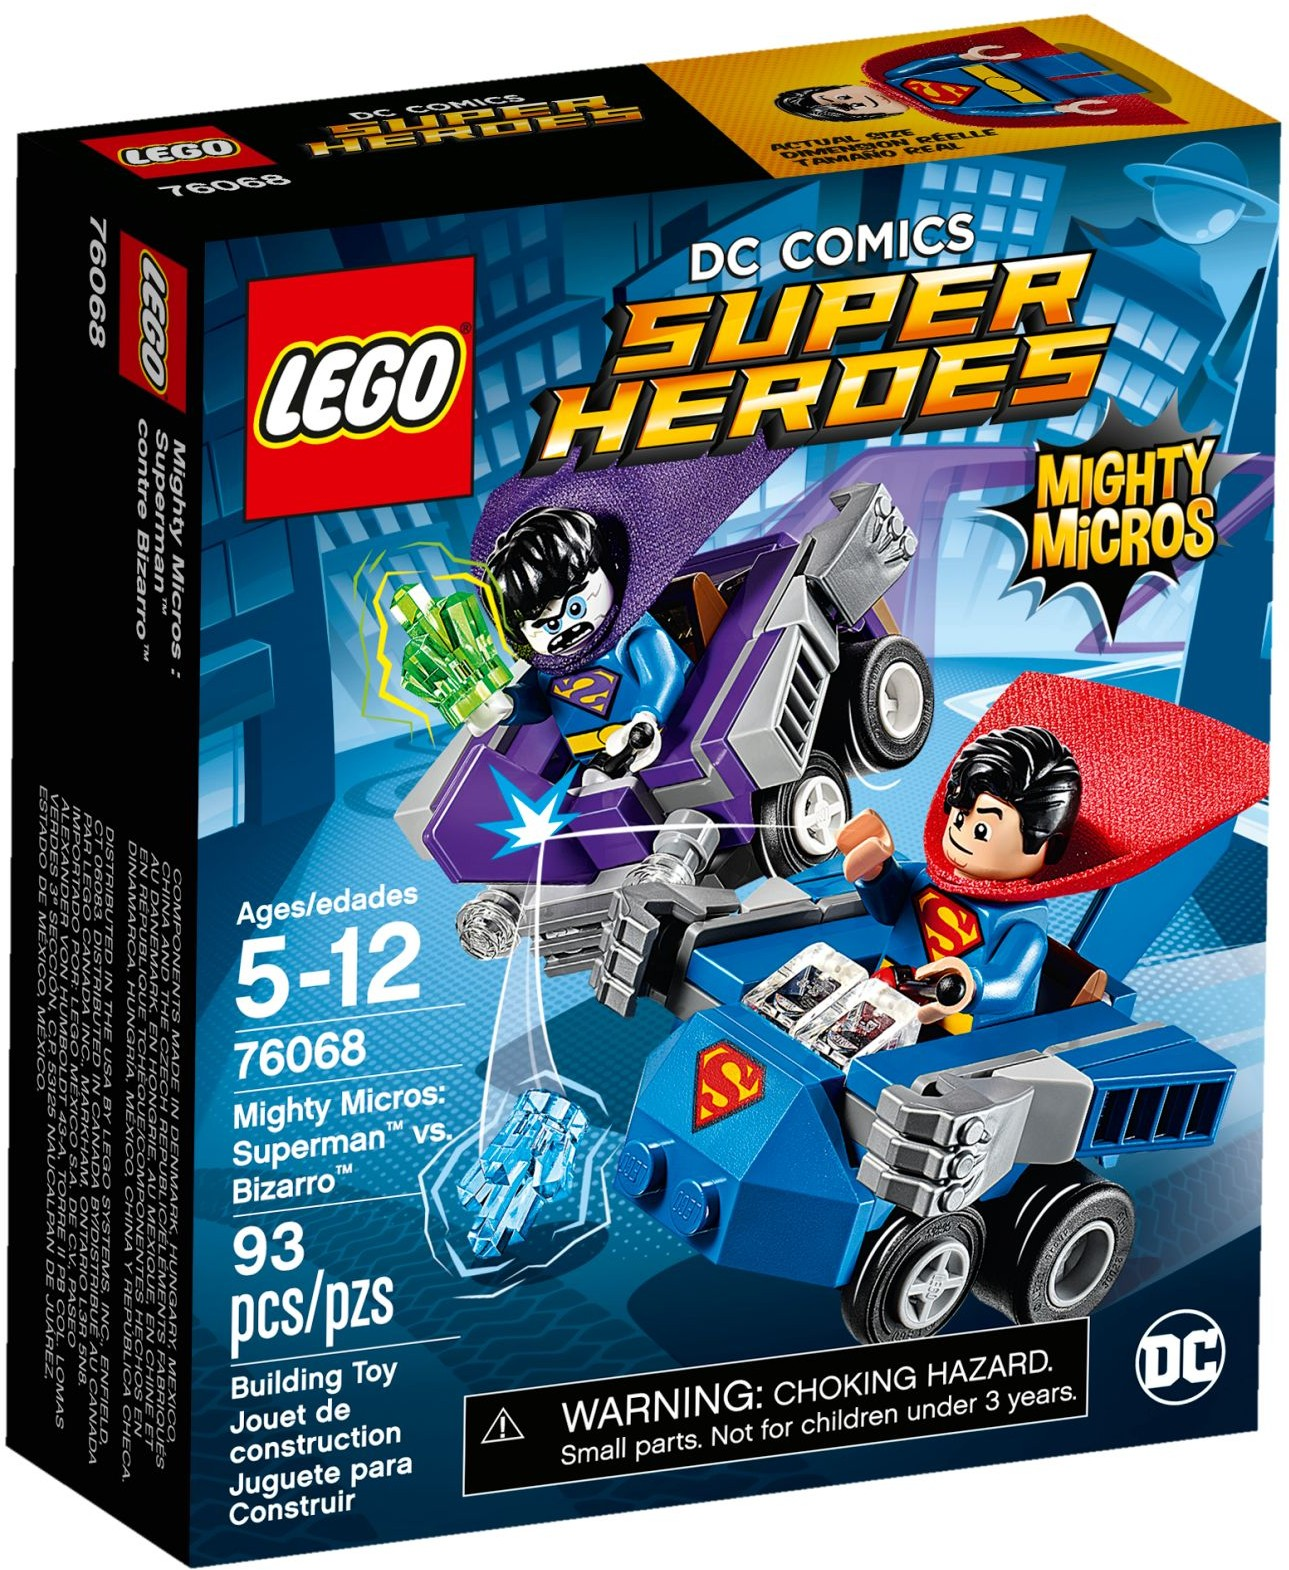 76068 Mighty Micros: Superman vs. Bizarro